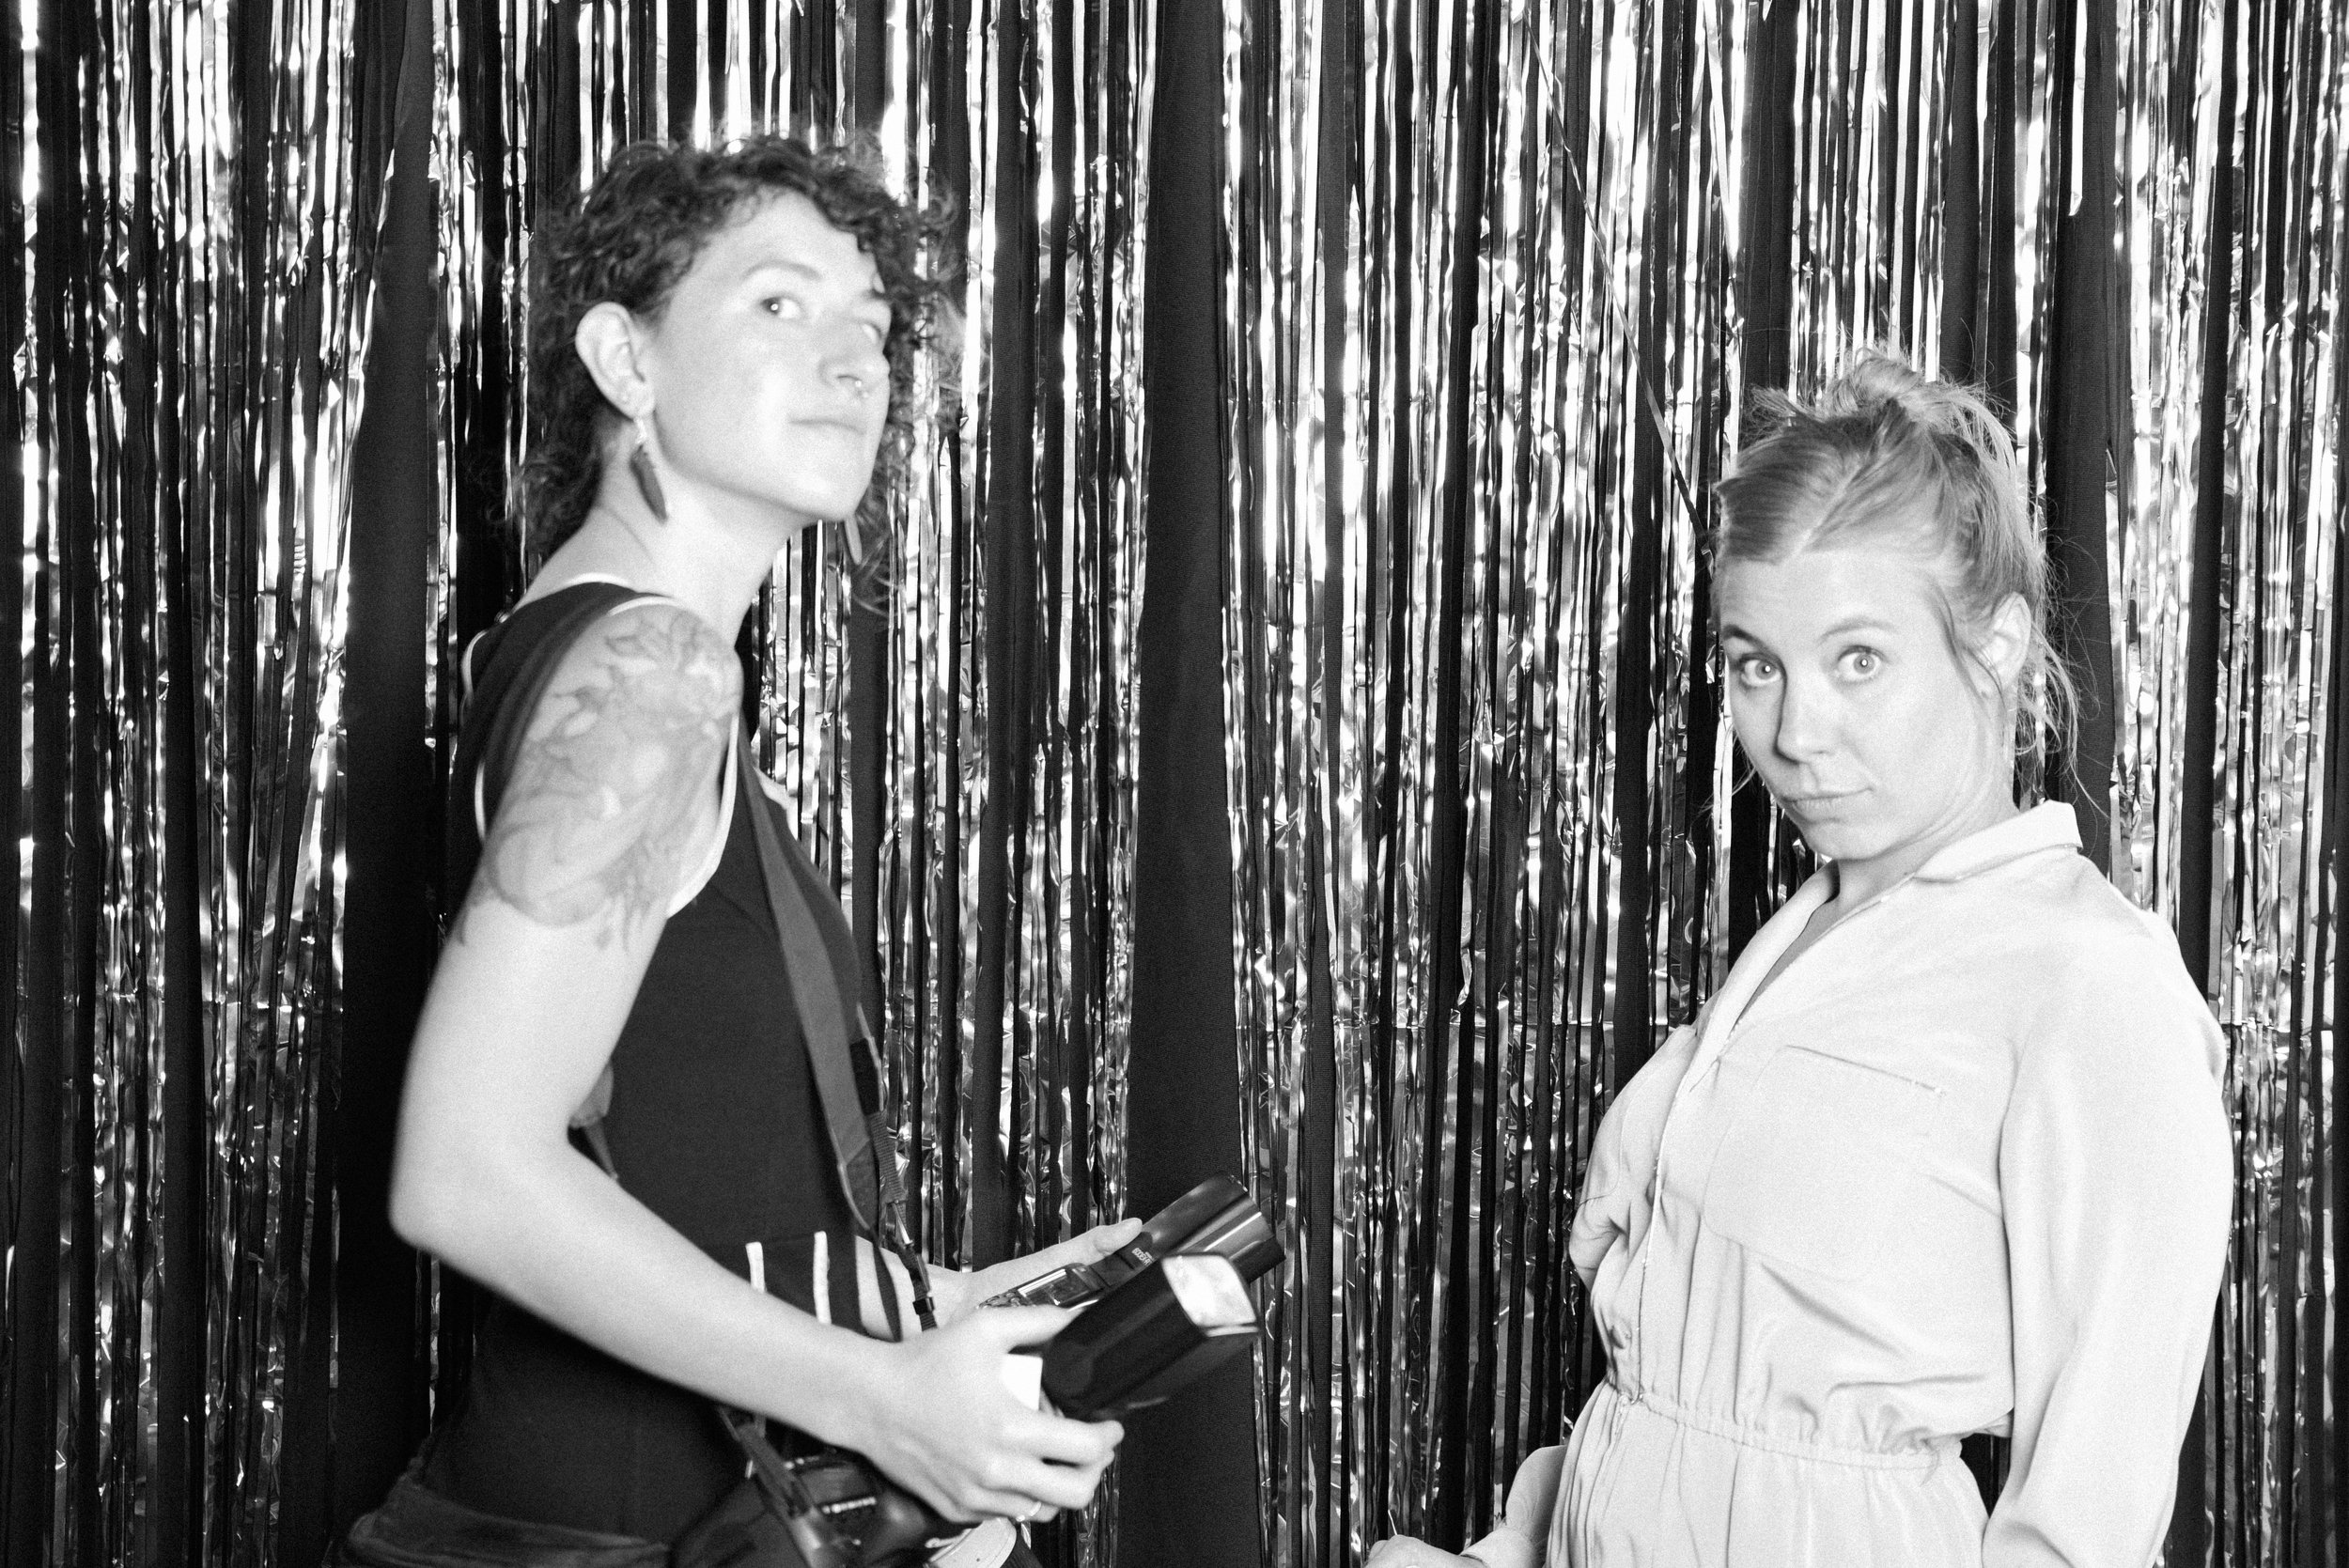 Kara&Justinforever01169.jpg